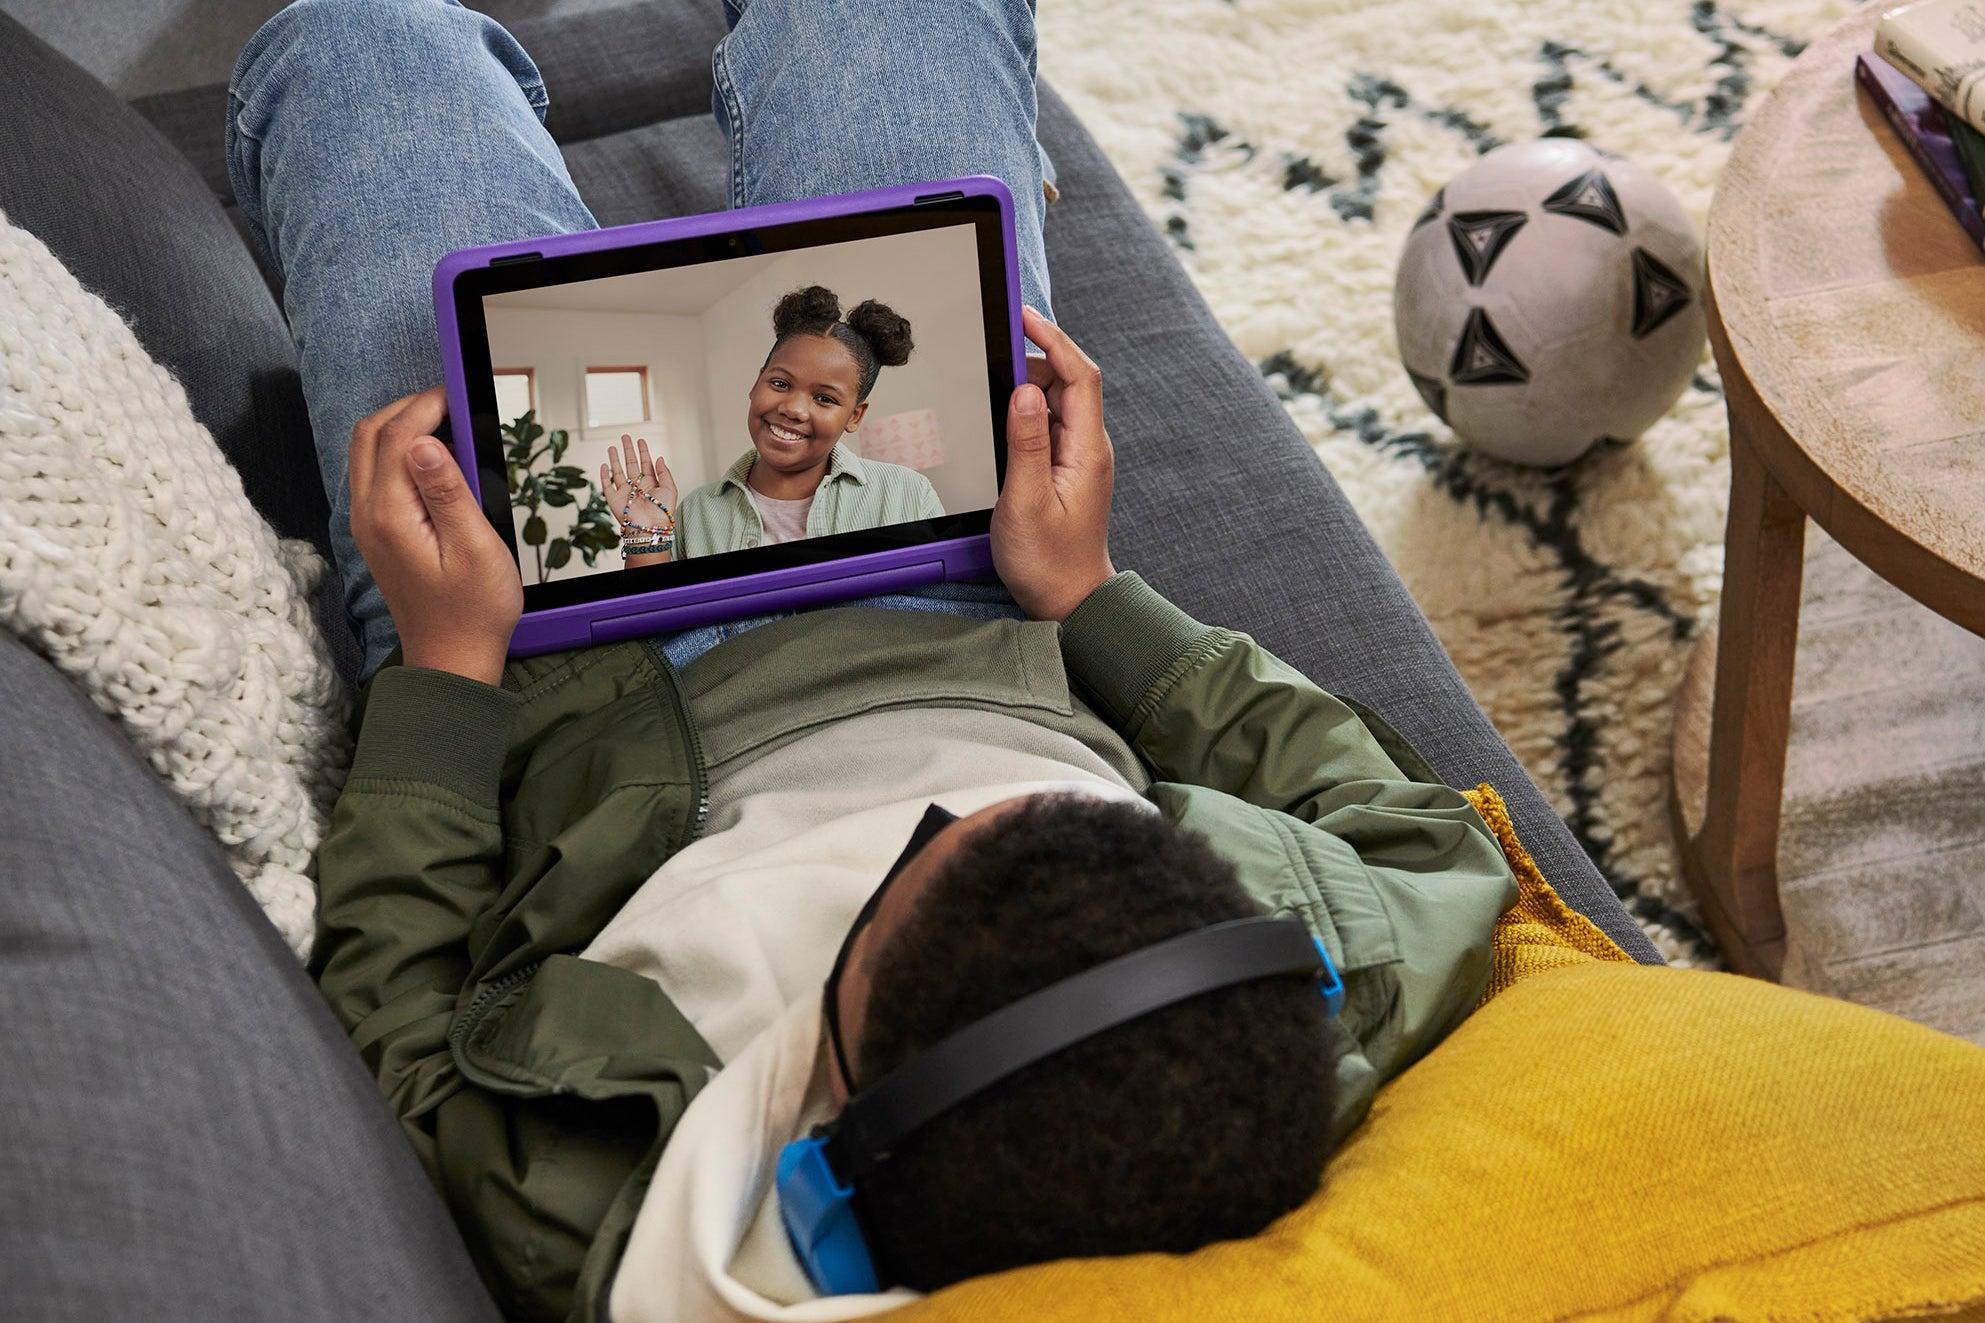 Kids using the Amazon Fire Kids Pro tablet